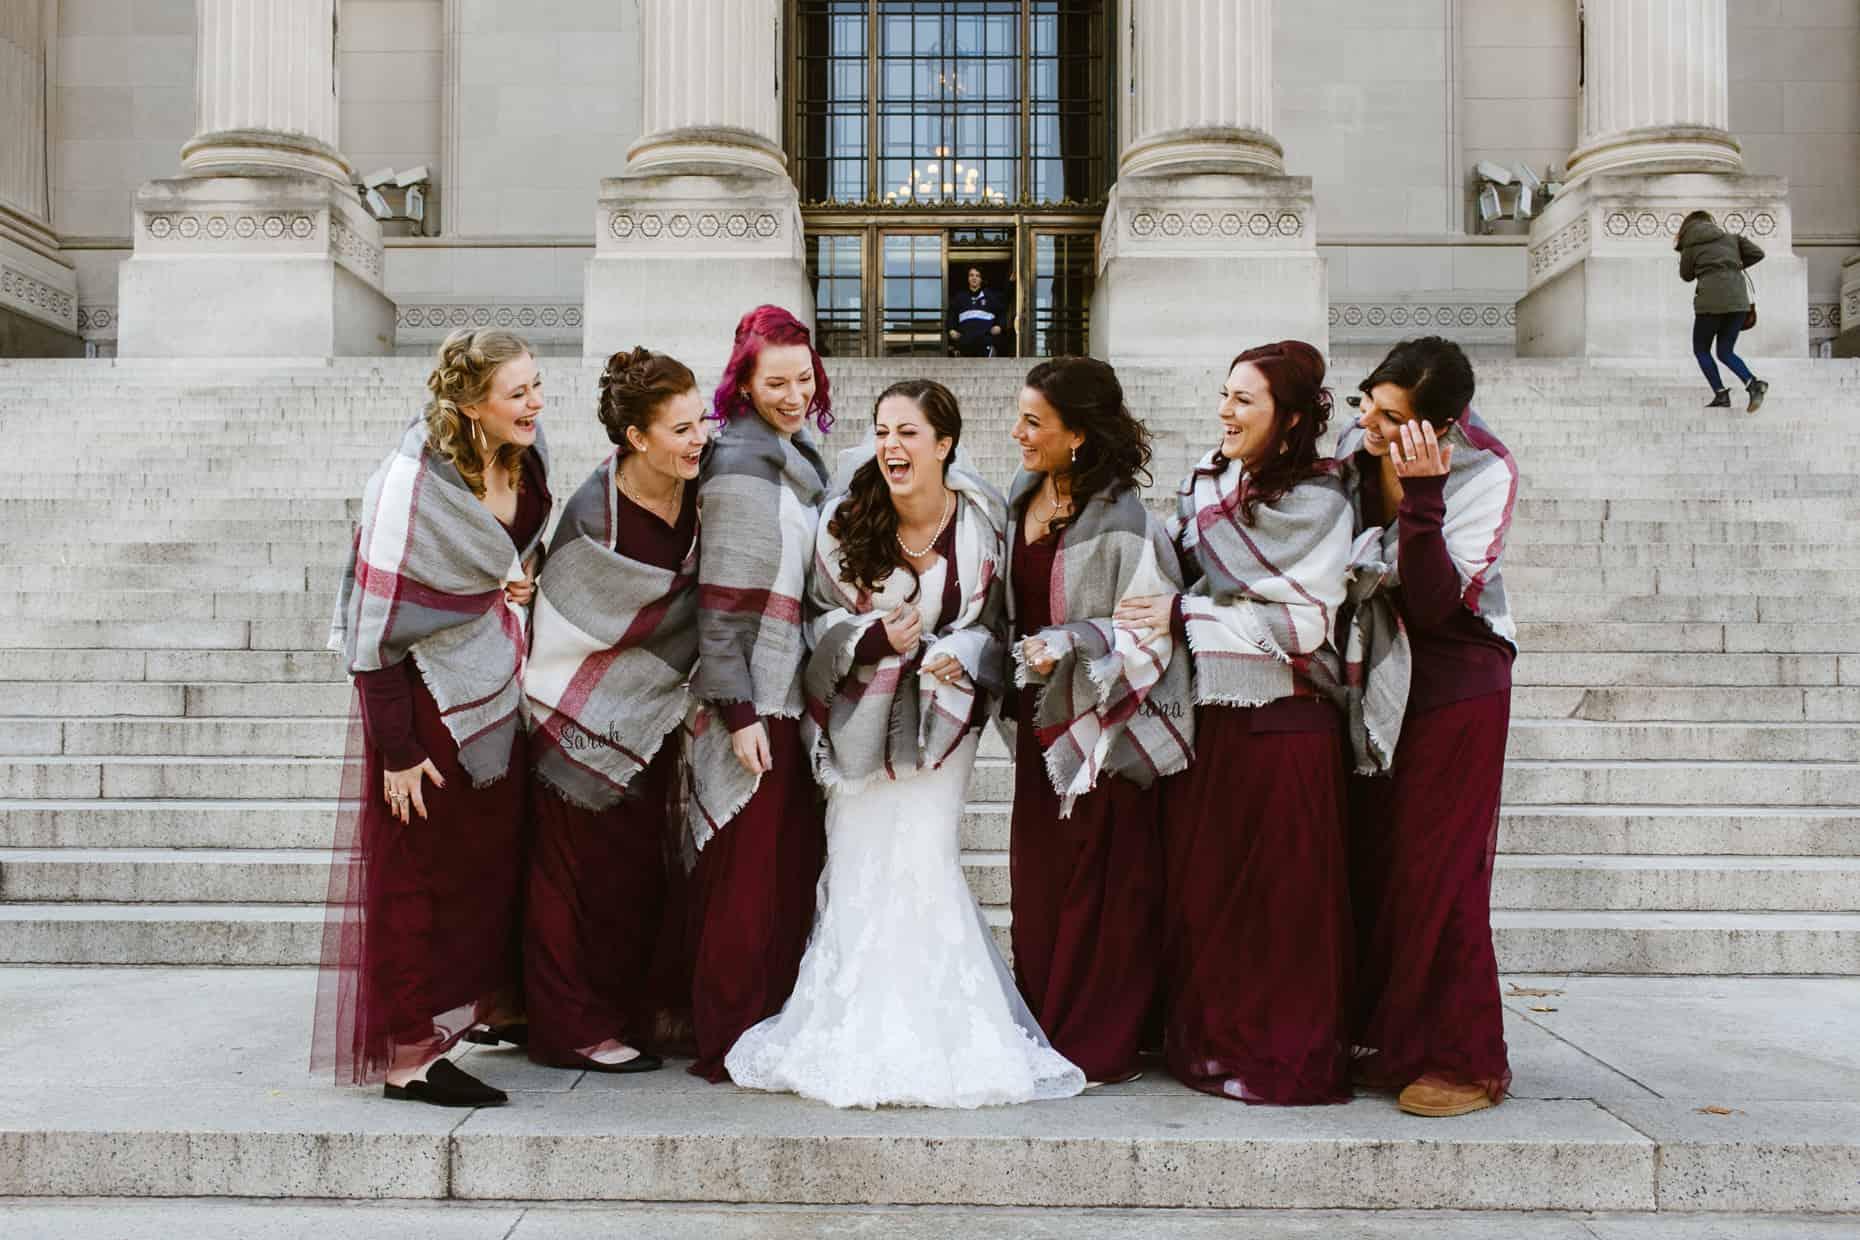 Franklin Institute Weddings